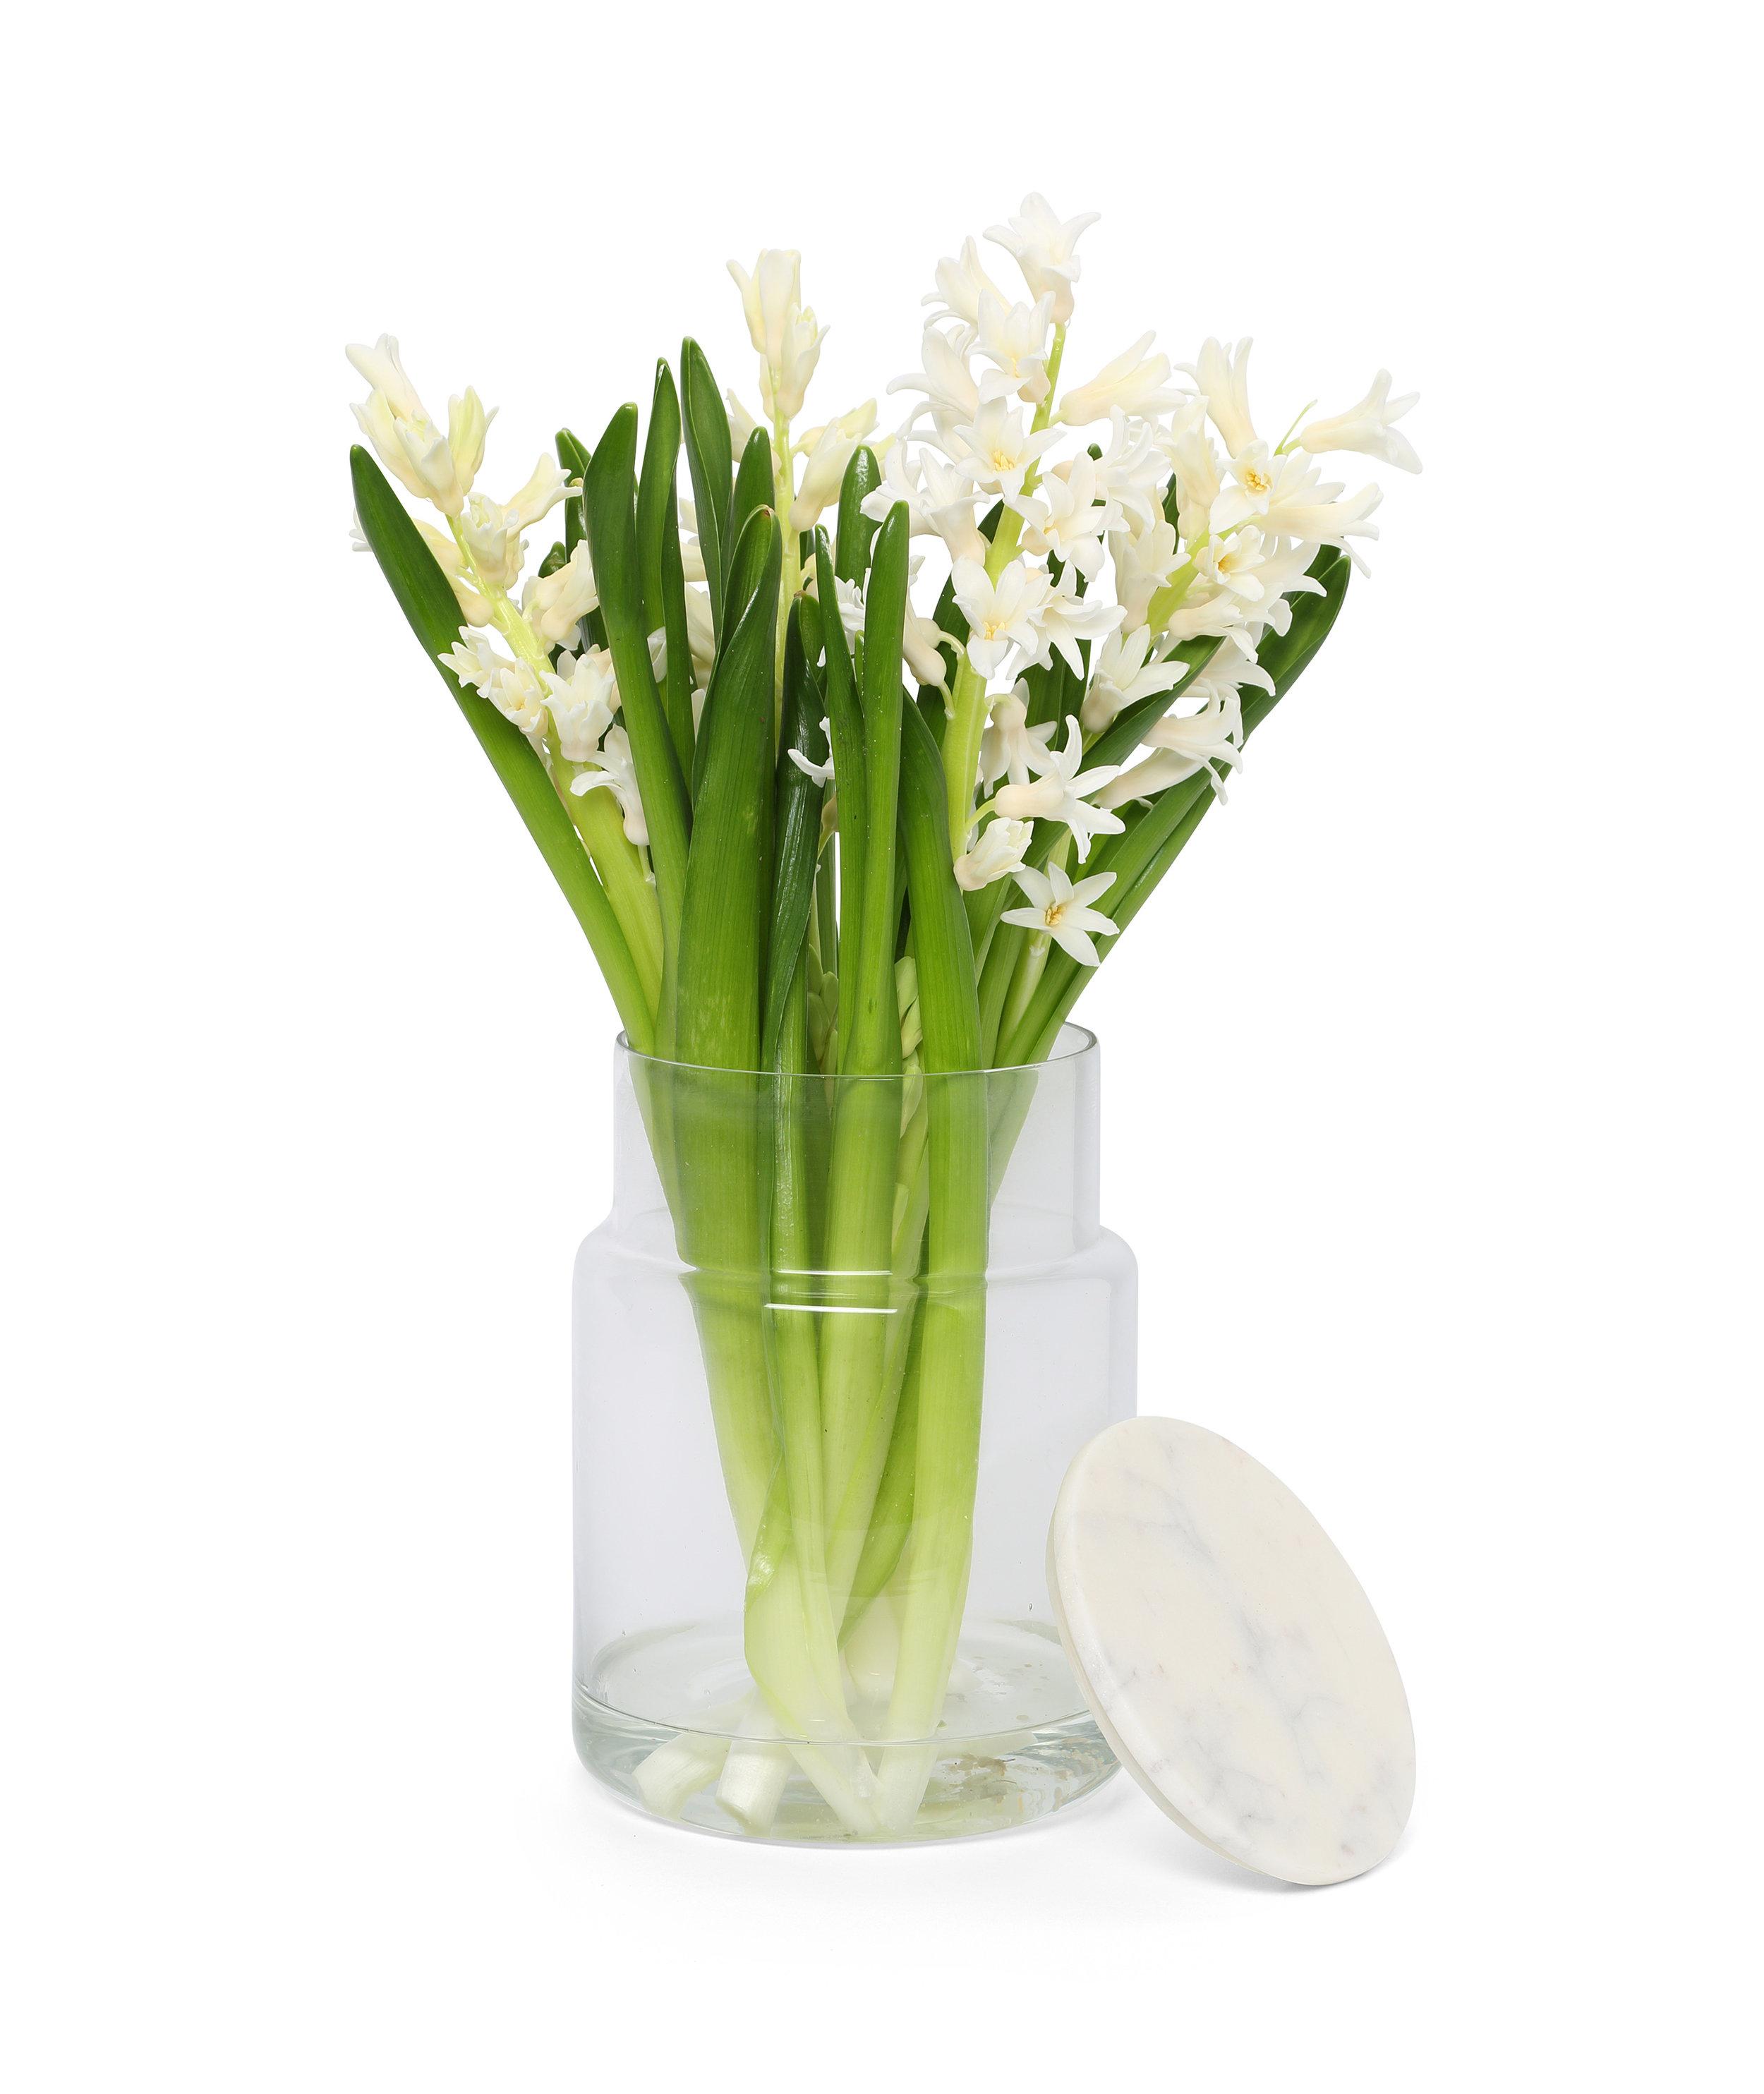 webMarble Basics_Big Blanc Bloom Jar with flowers.jpg